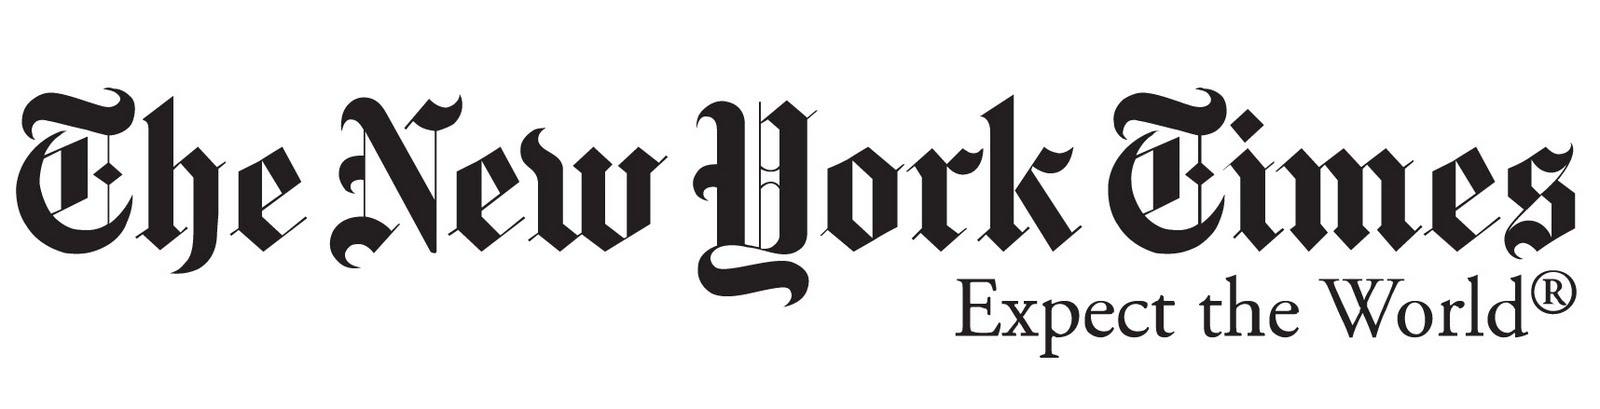 https://2.bp.blogspot.com/_g56OFpkth4g/SwGHCE8ey0I/AAAAAAAAAa4/EK7PTLzen3U/s1600/new+york+times+logo.jpg